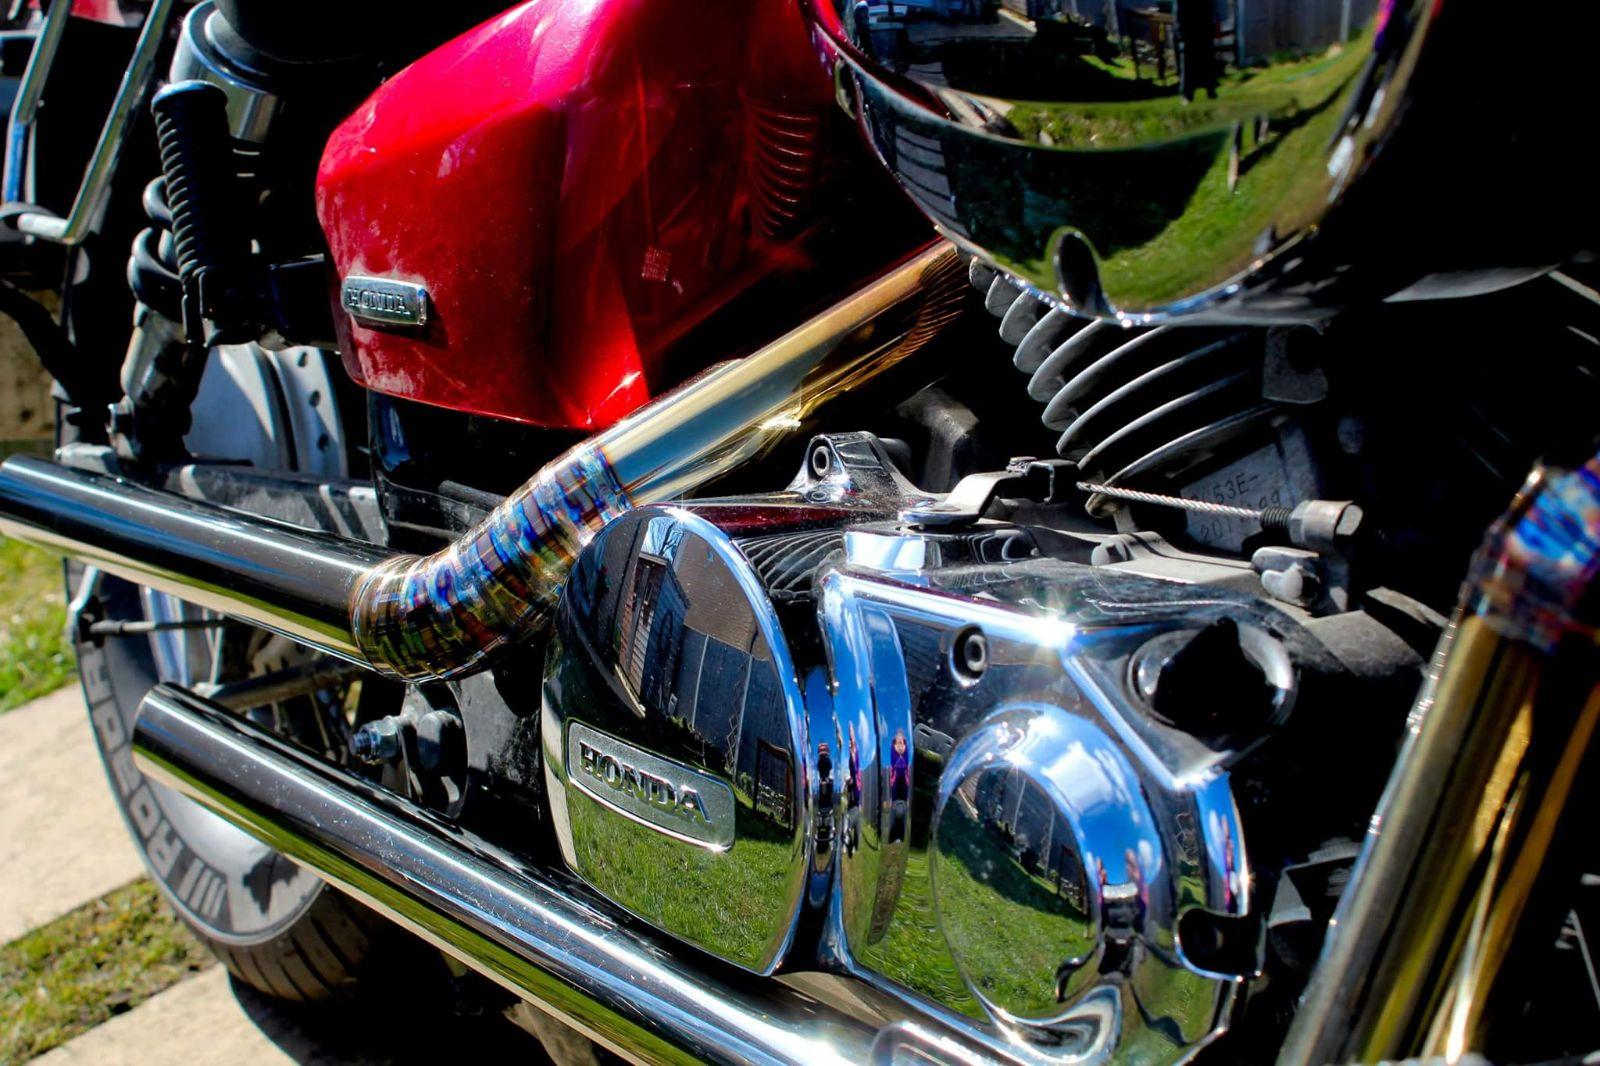 Honda Shadow custom